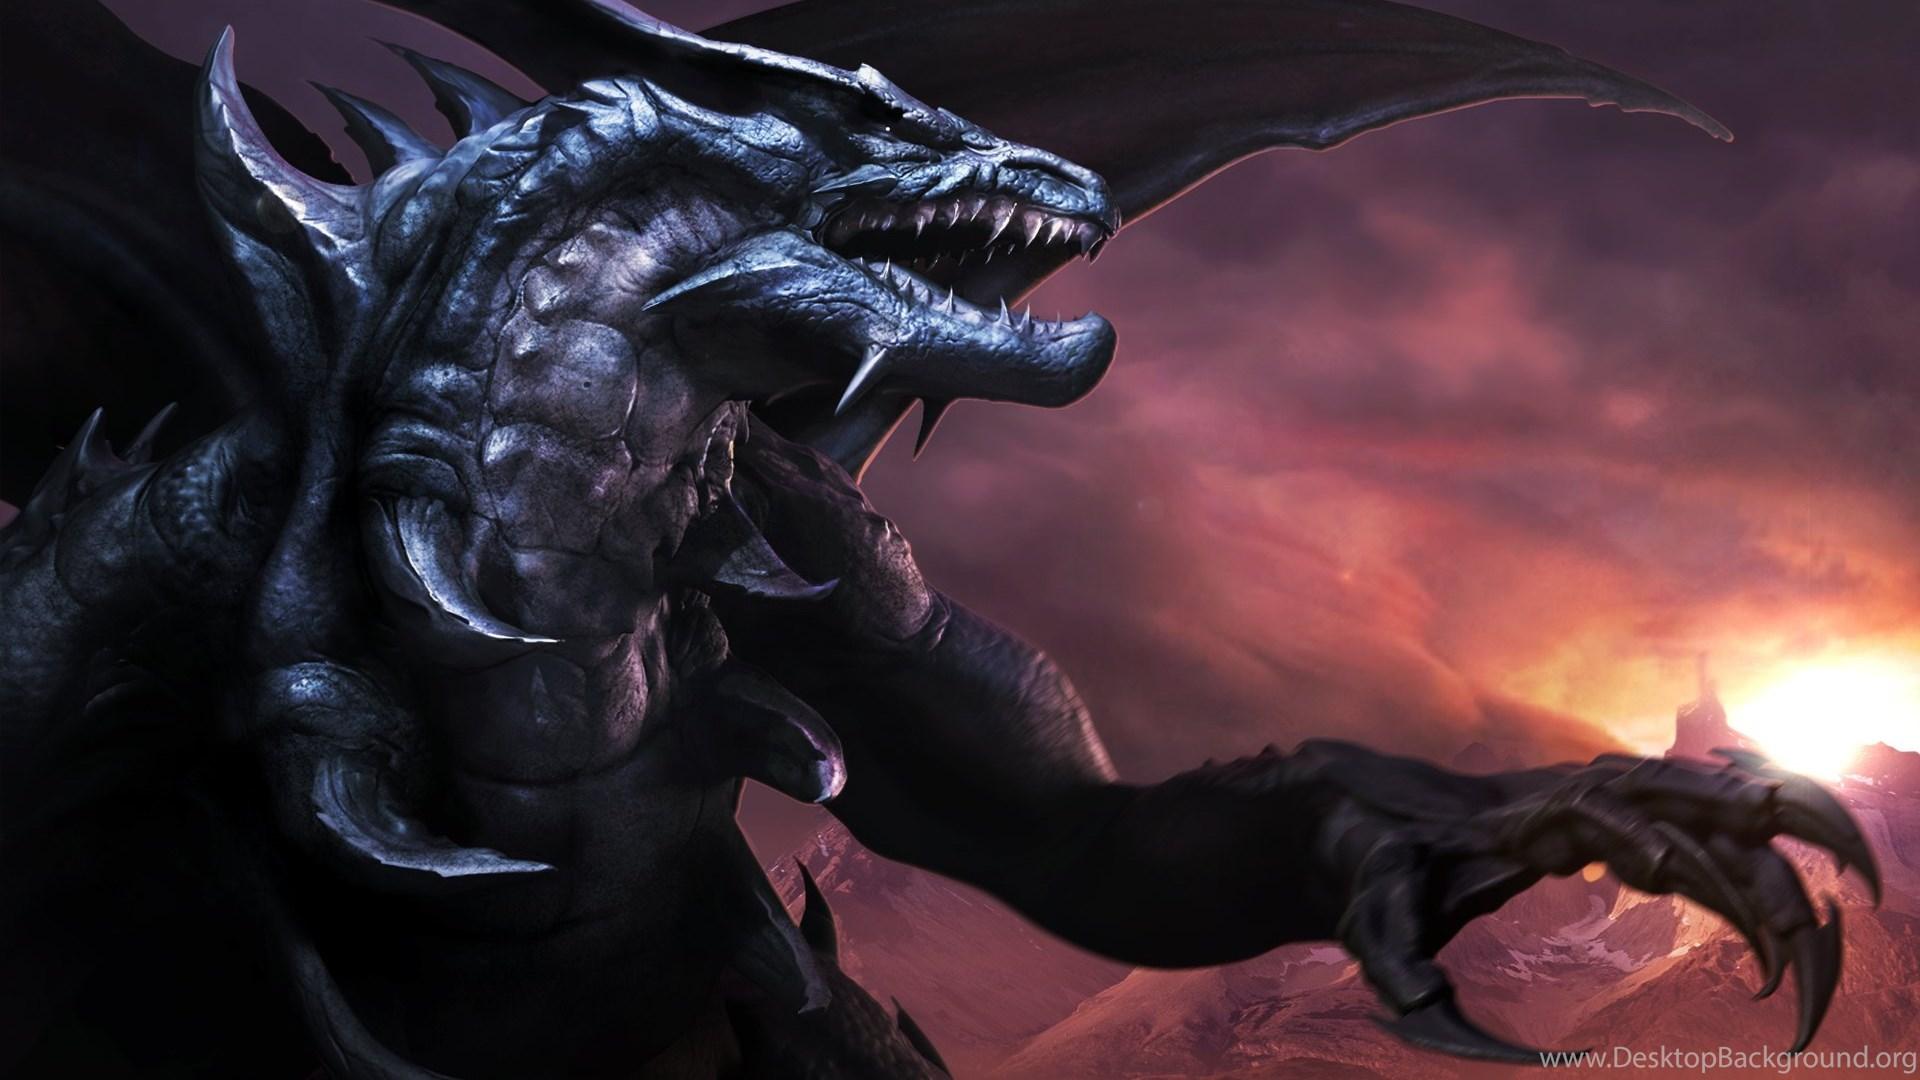 High Resolution Fantasy Black Dragon Wallpapers HD 12 Full Size